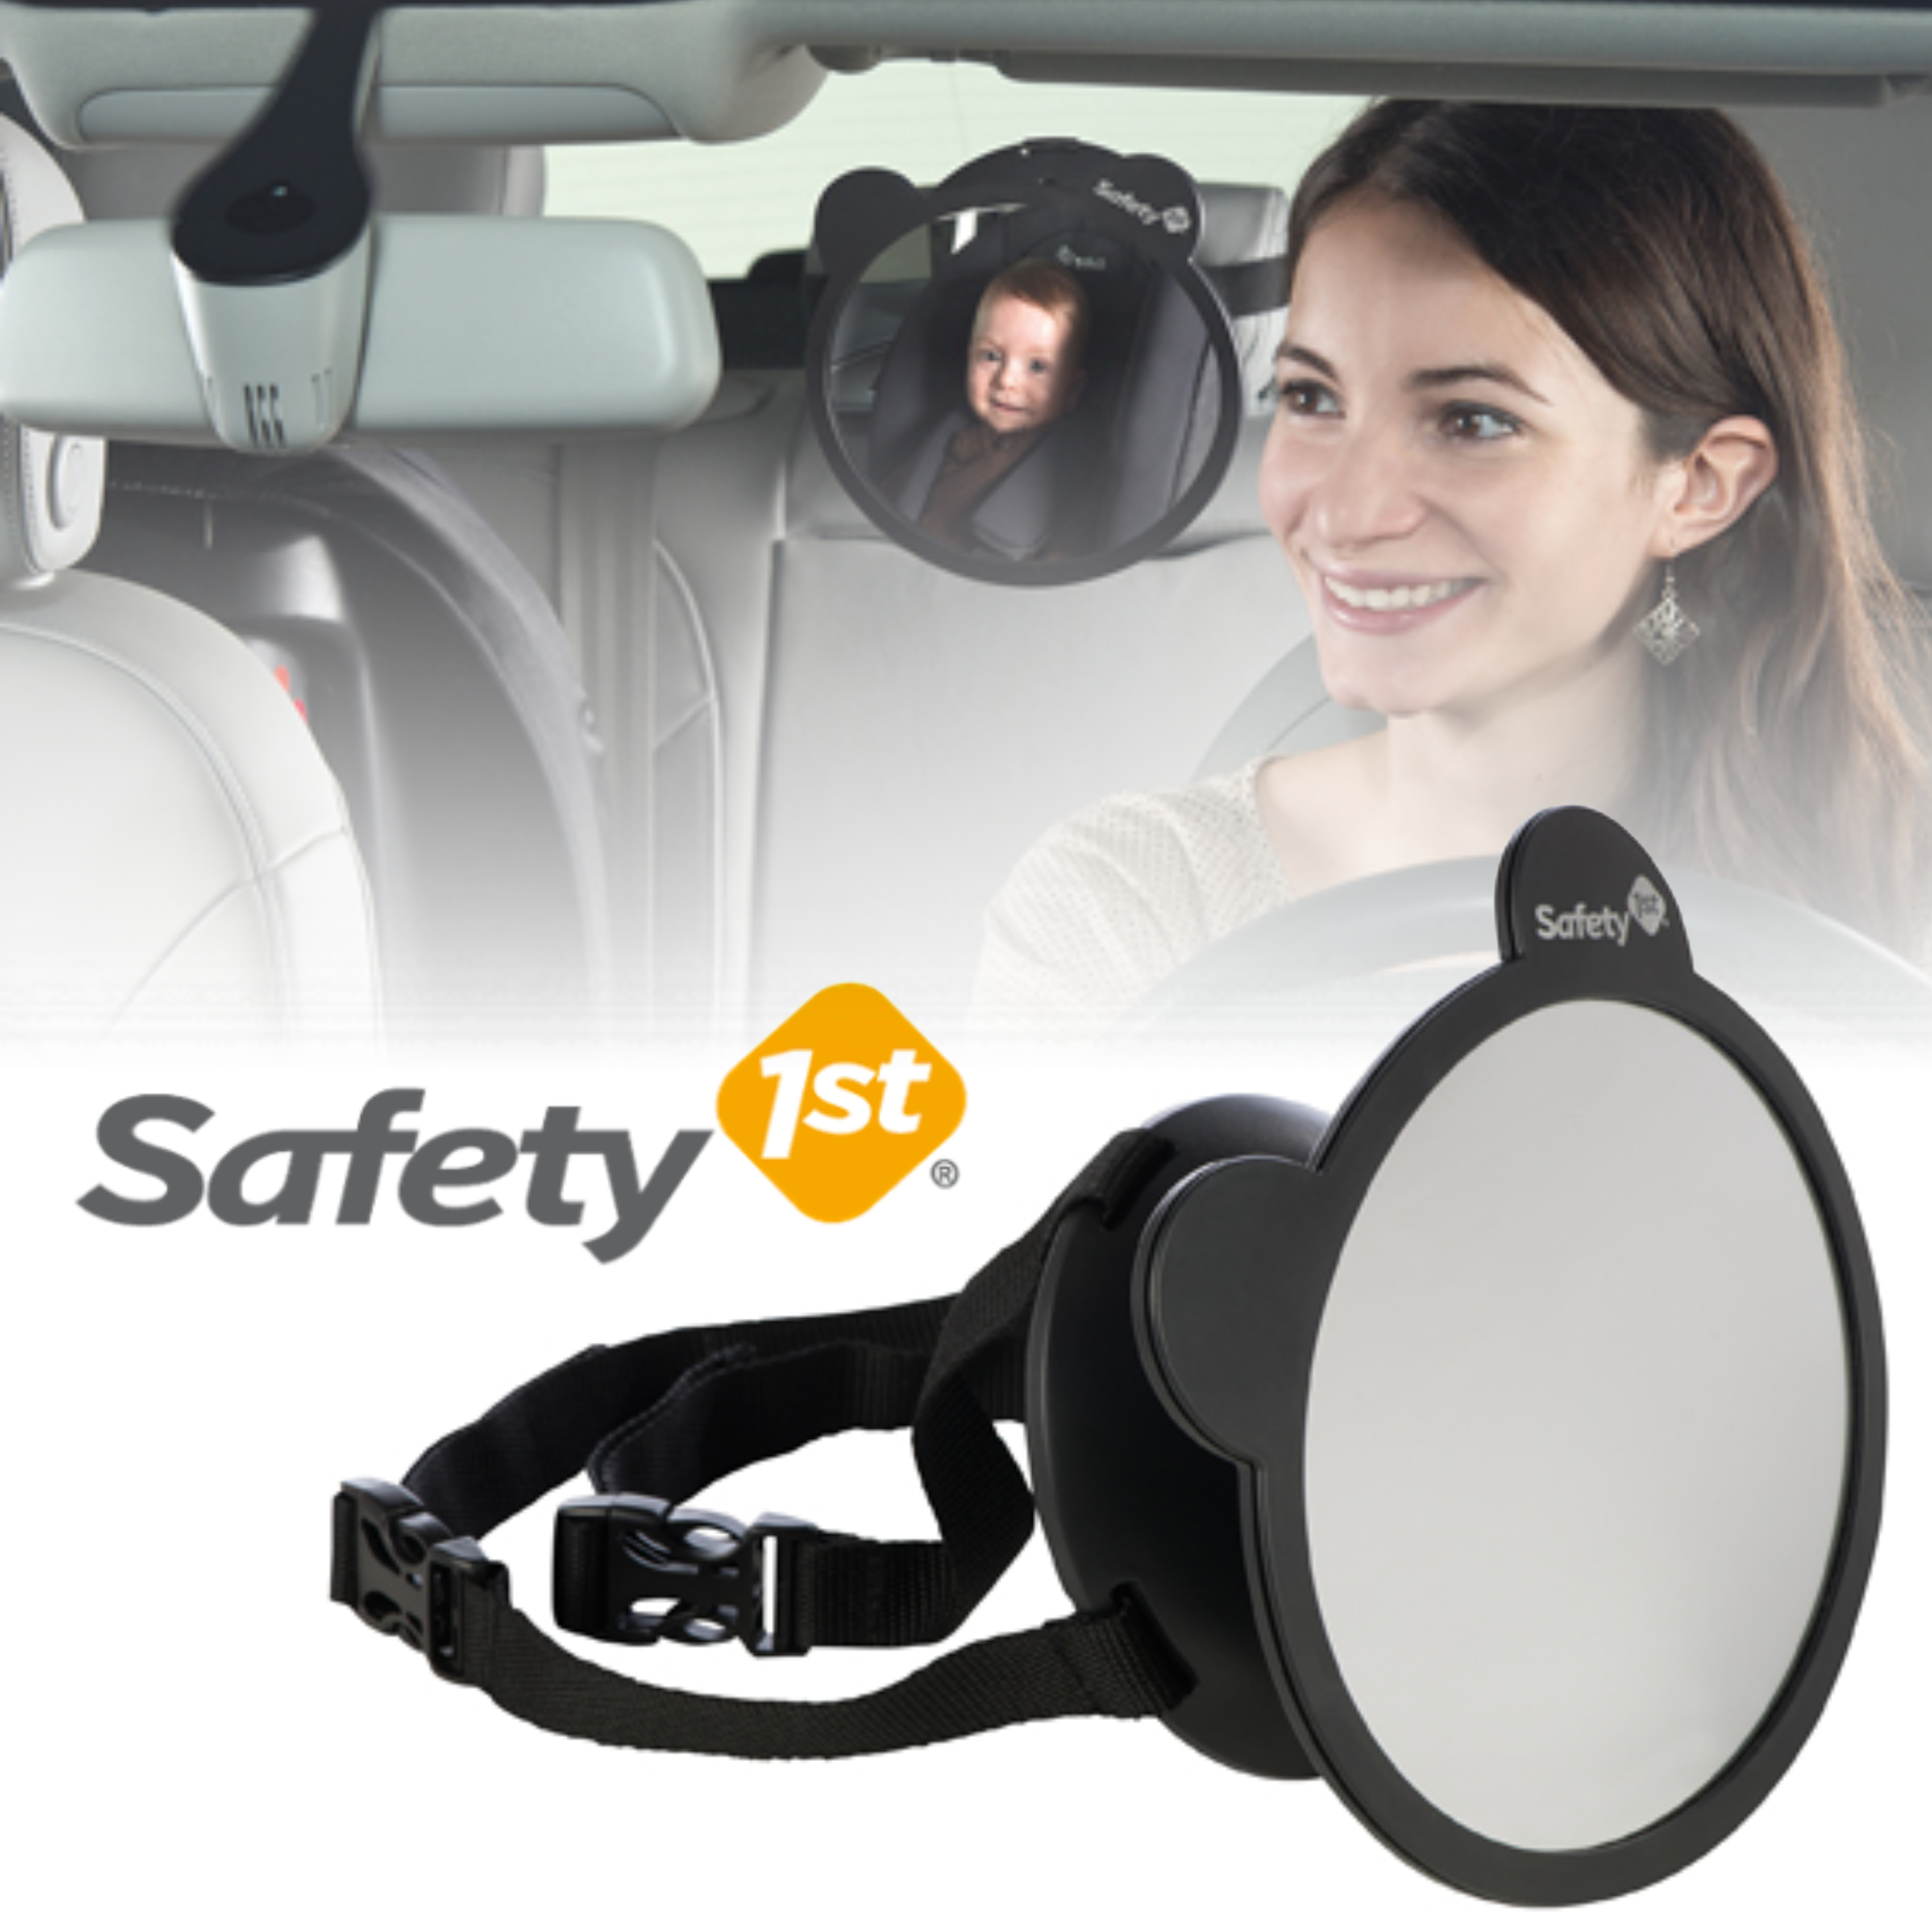 Sentinel Safety 1st Back Seat Baby Car Mirror Rear Swiel Visor Kid Adjustable